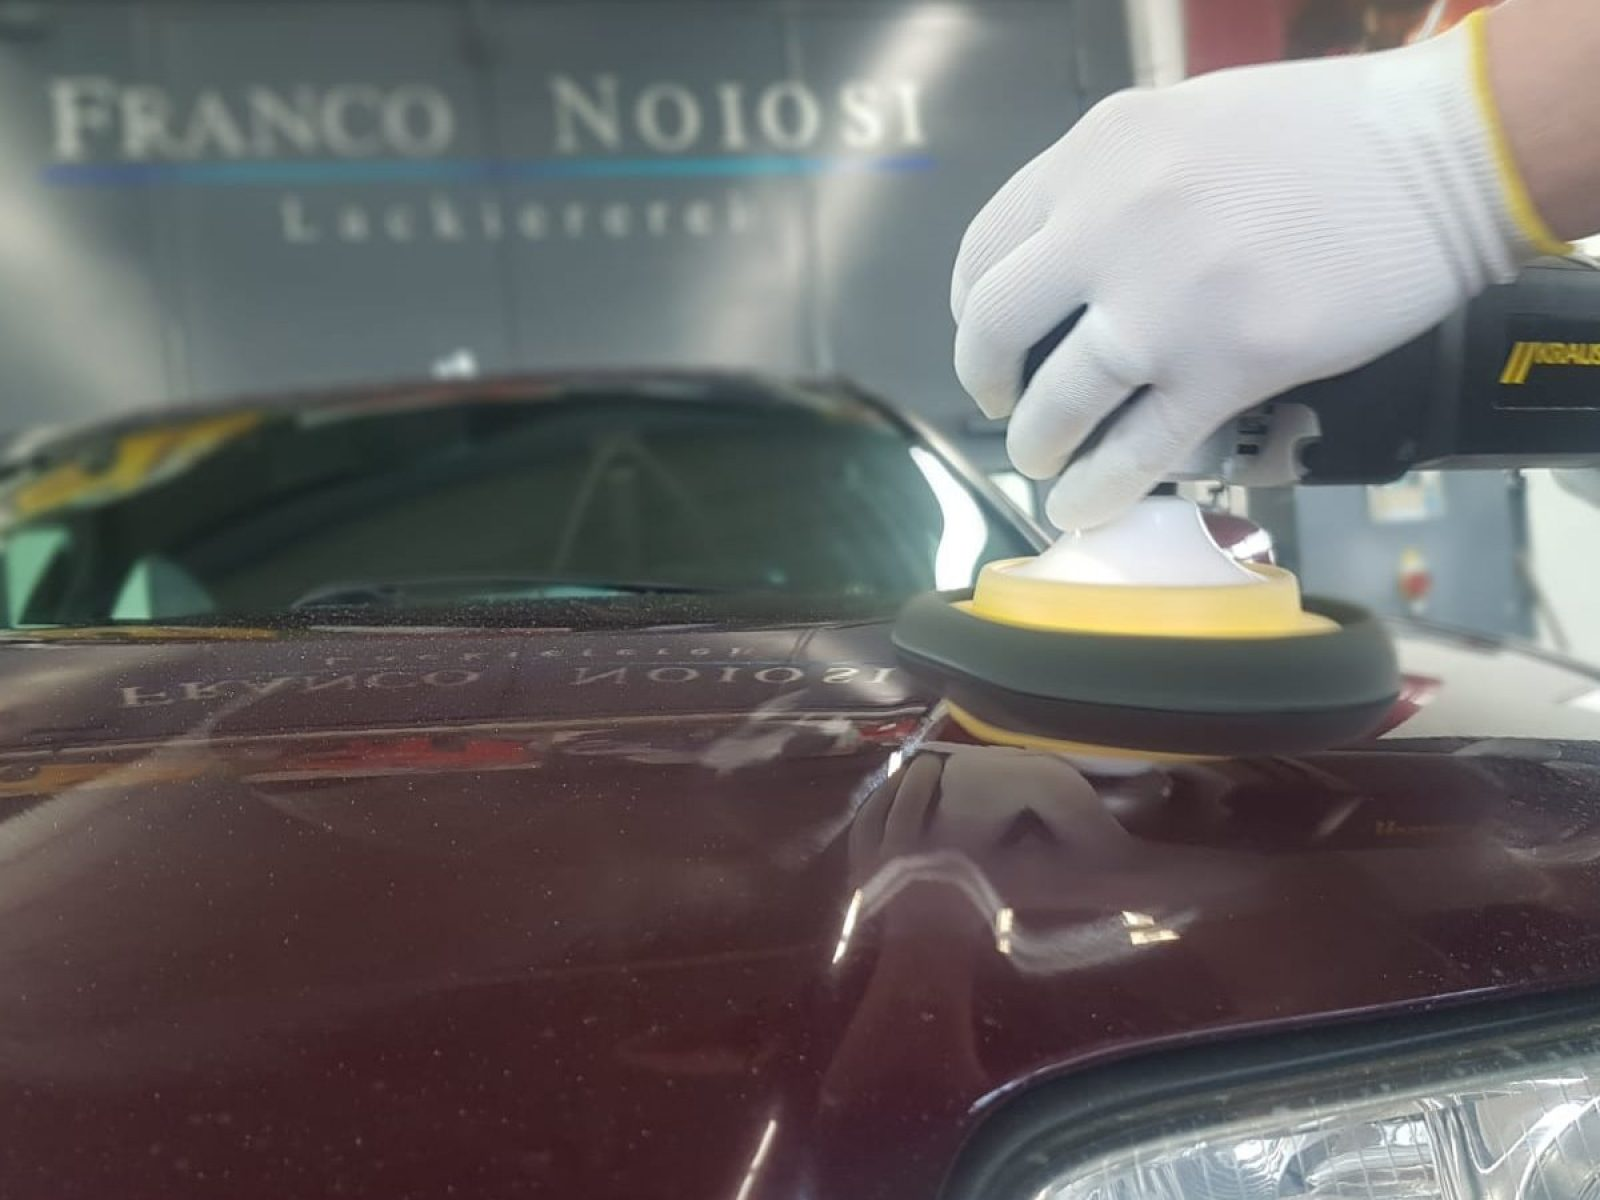 lackreinigung-lackpolitur-handwaesche-autoaufbereitung-lackiererei-noiosi-freiburg-gottenheim